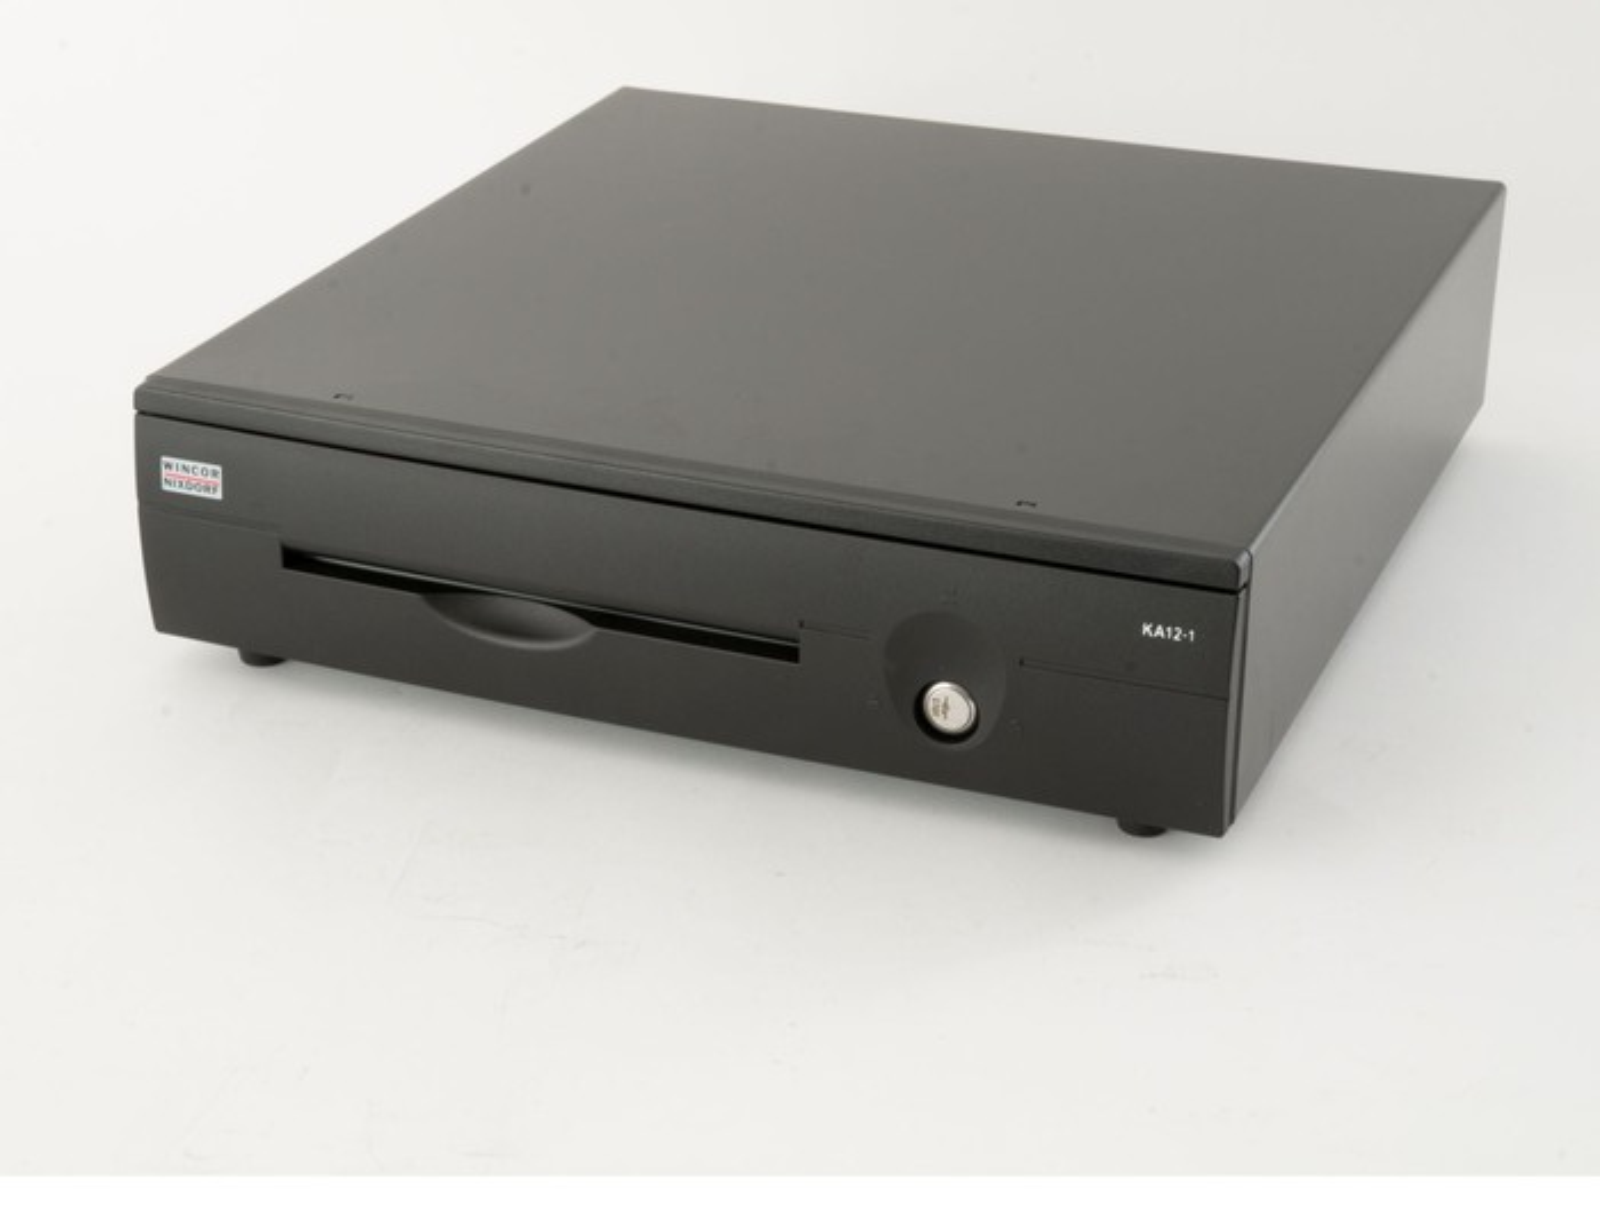 A Diebold Nixdorf cash drawer.